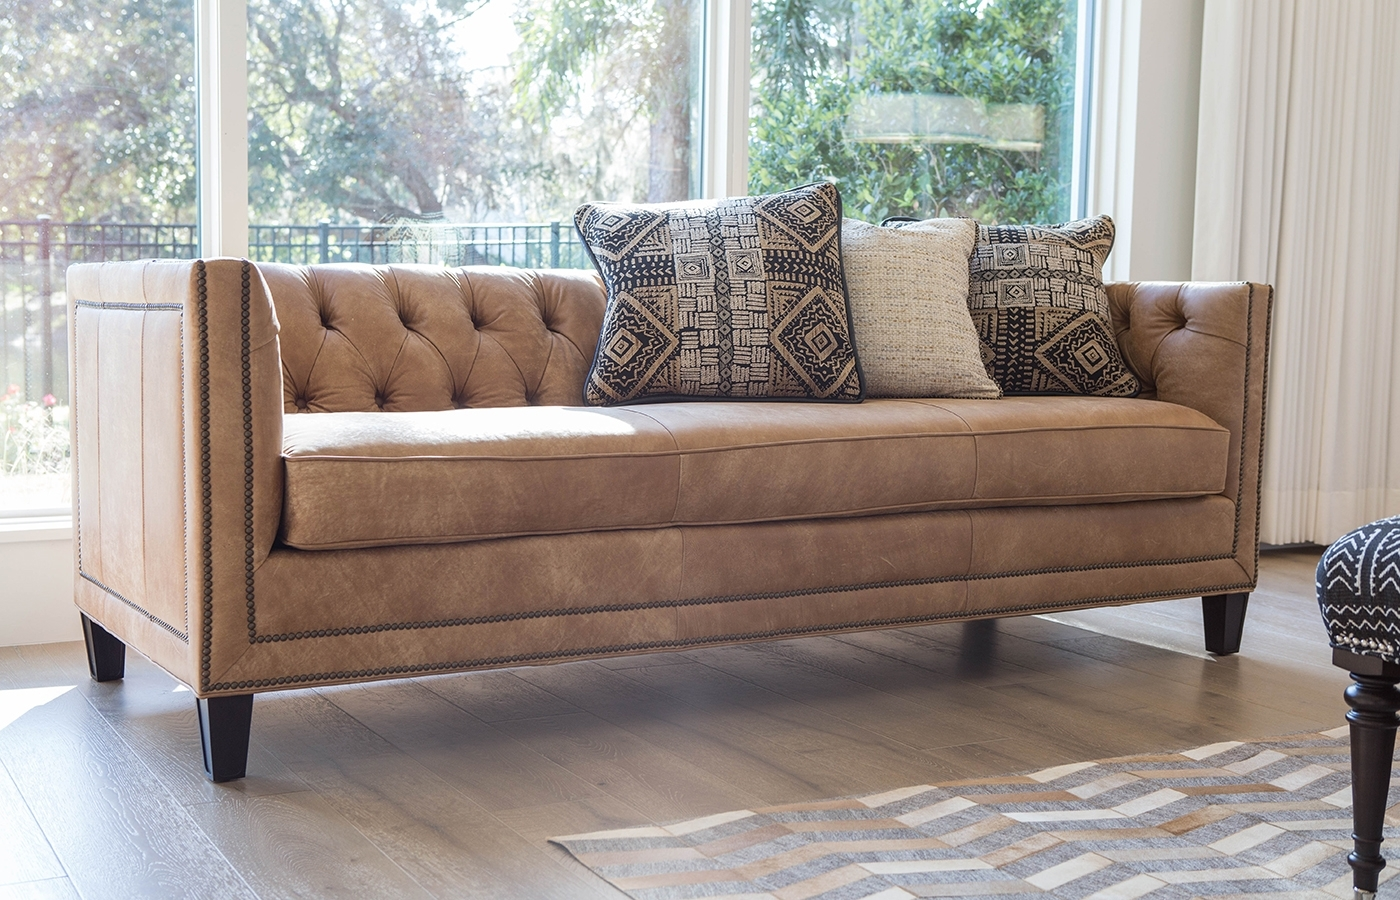 Fashionable Norwalk Sofas In Norwalk Furniture (View 7 of 20)